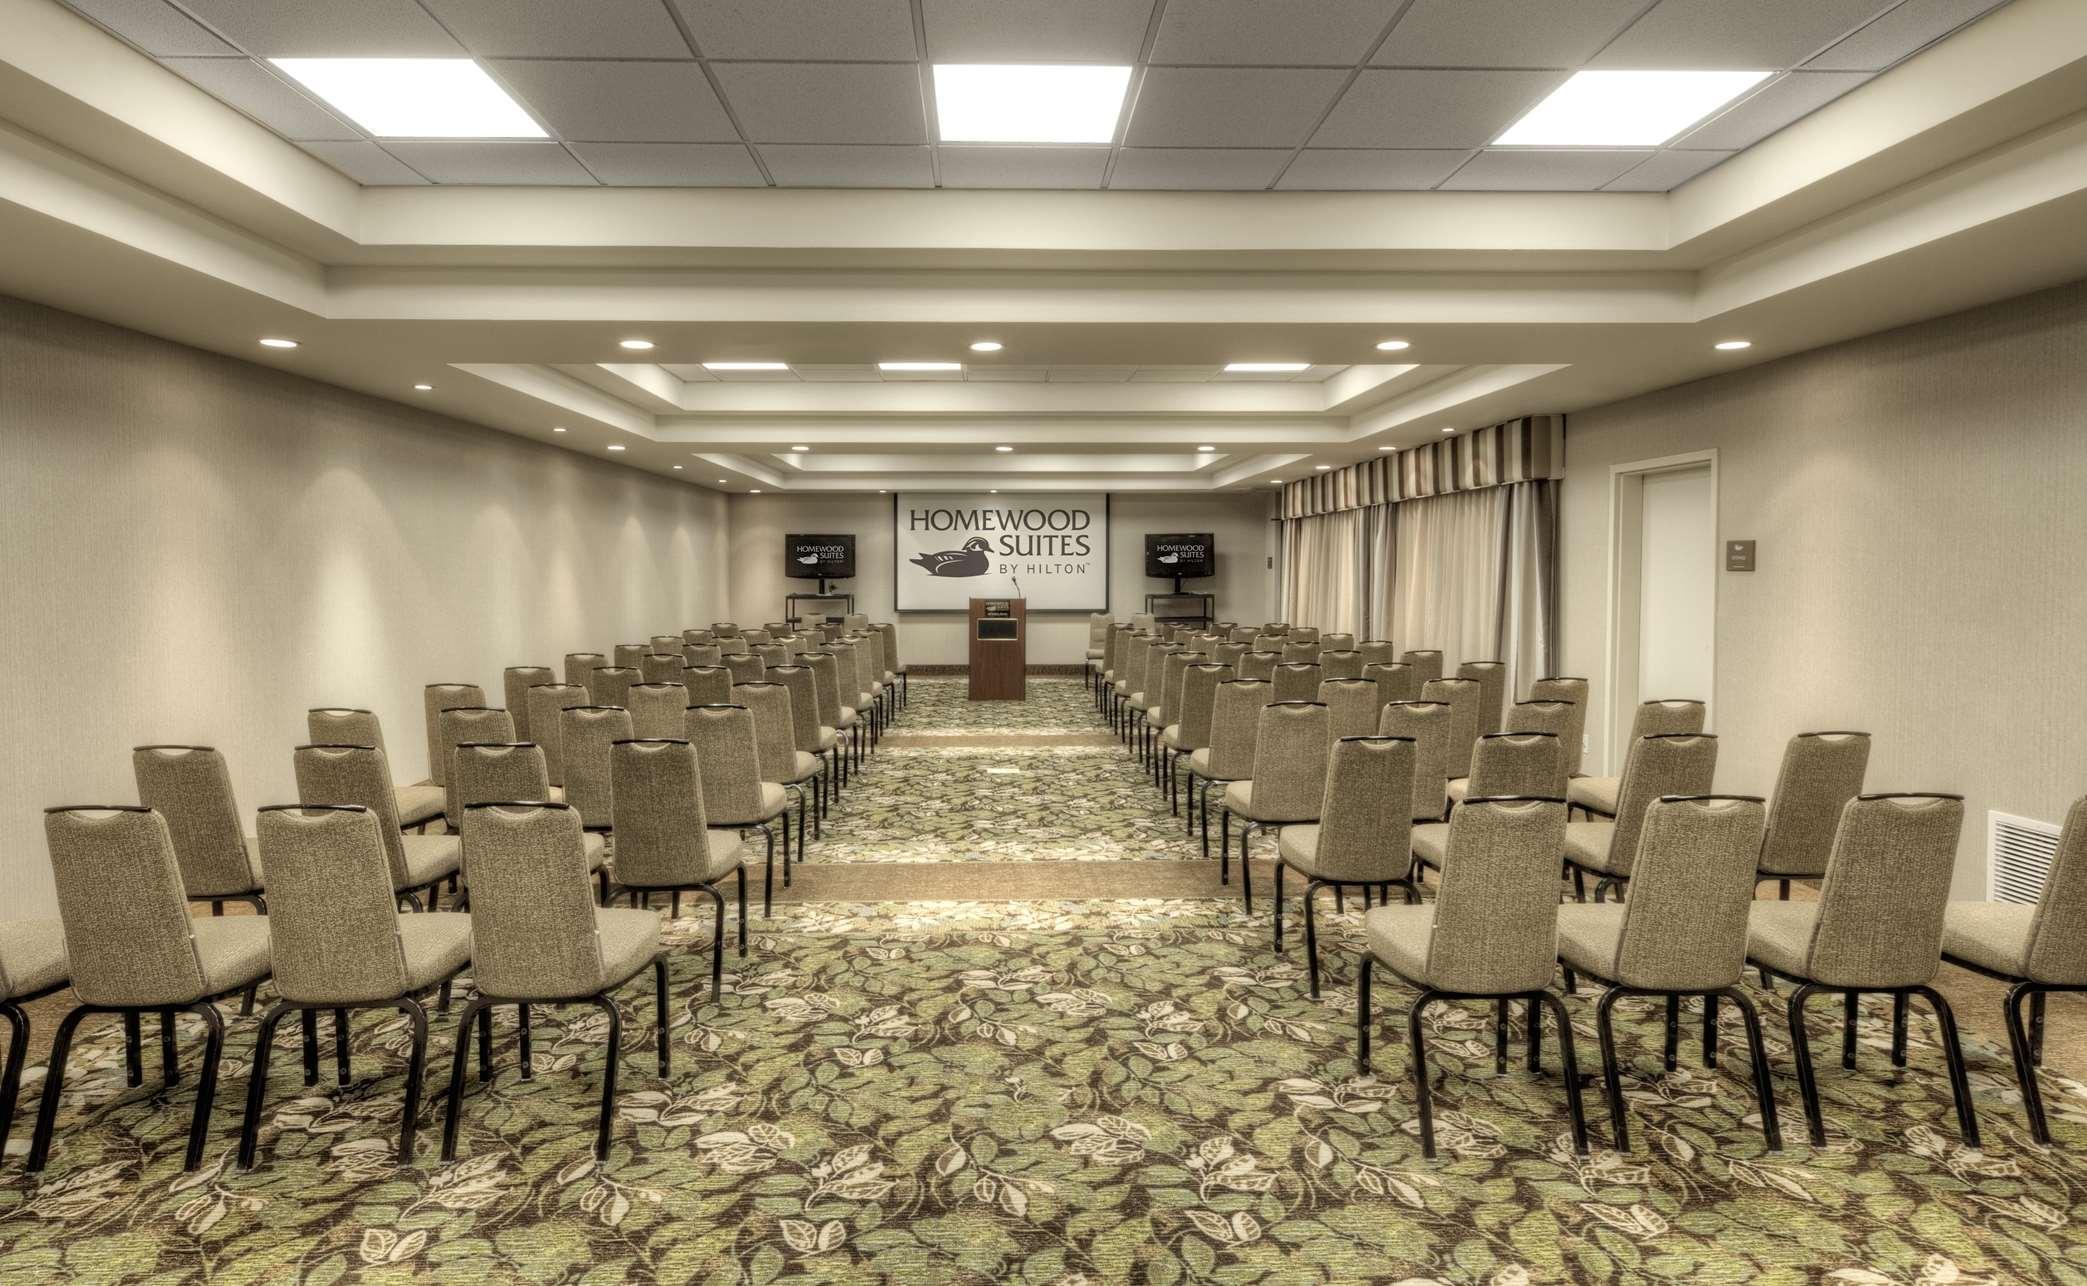 Homewood Suites by Hilton Victoria, TX image 15